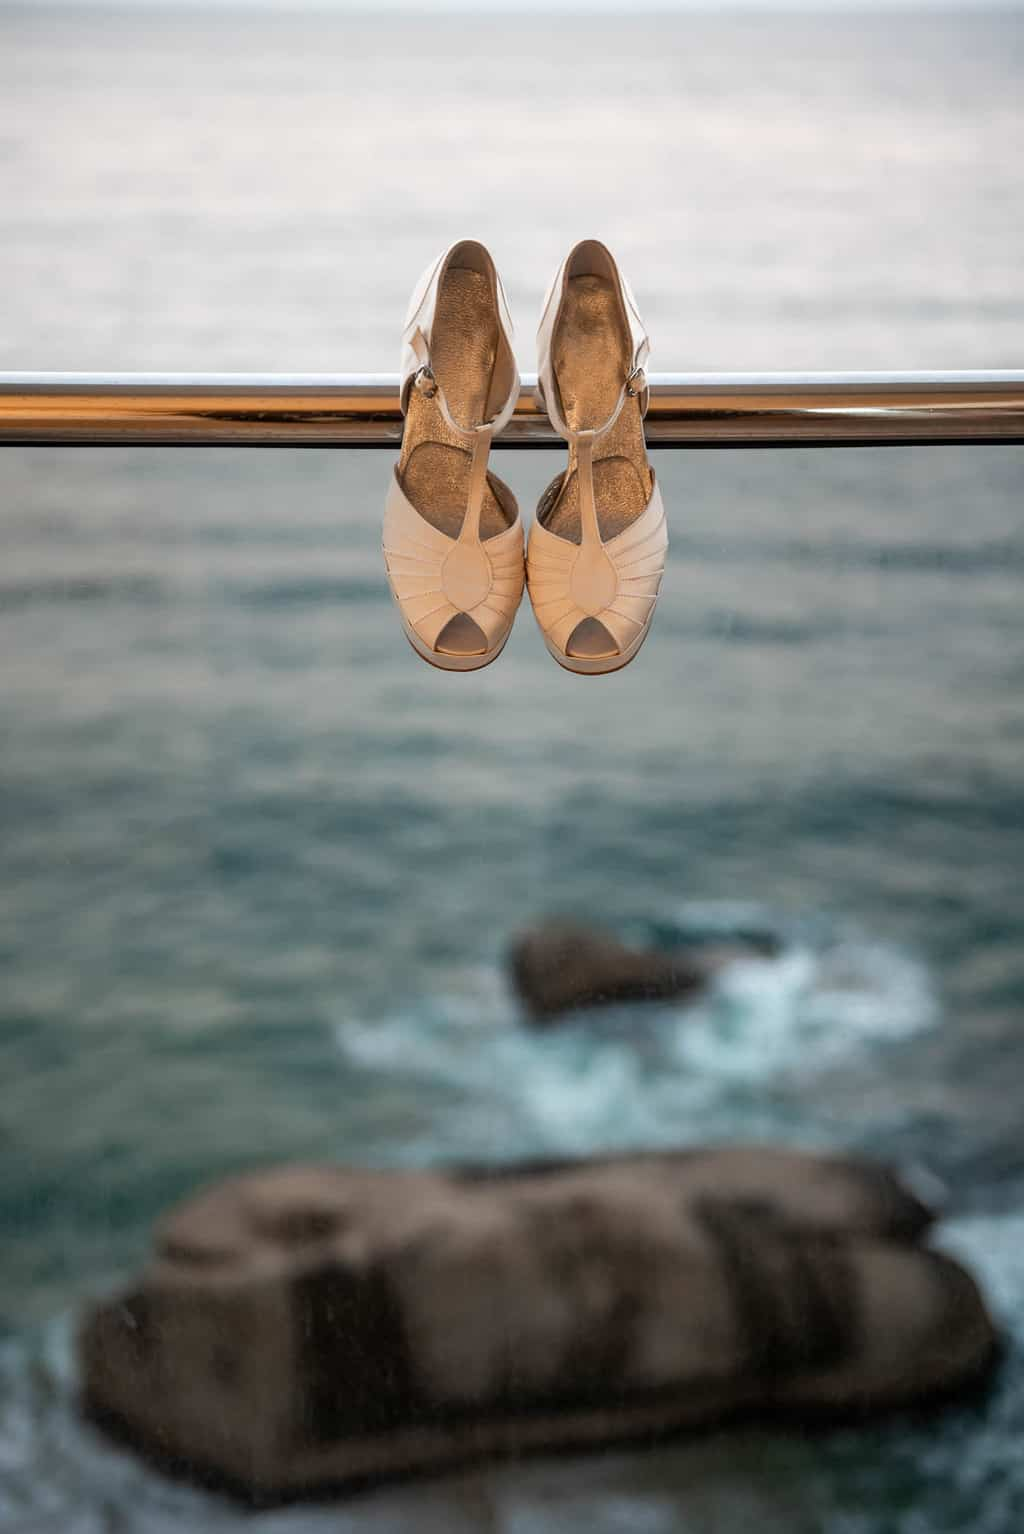 casamento-luiza-e-gustavo-cerimonial-casamento-de-ideias-fotografia-lenine-serejo-making-of4